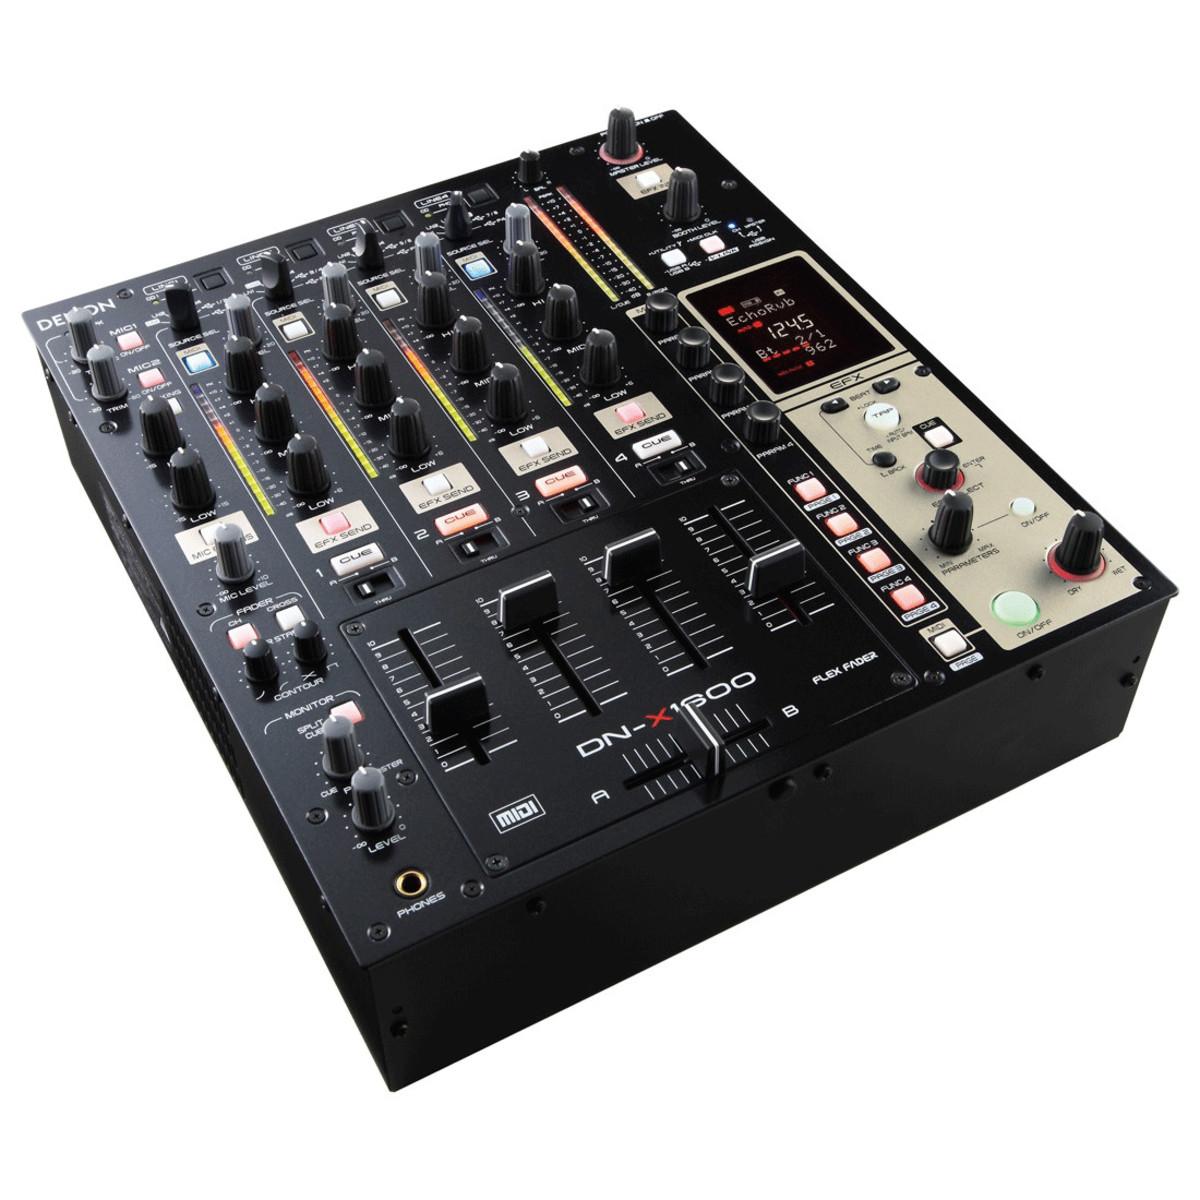 Digital Mixer Dj : disc denon dj dnx1600 4 channel digital dj mixer at ~ Russianpoet.info Haus und Dekorationen